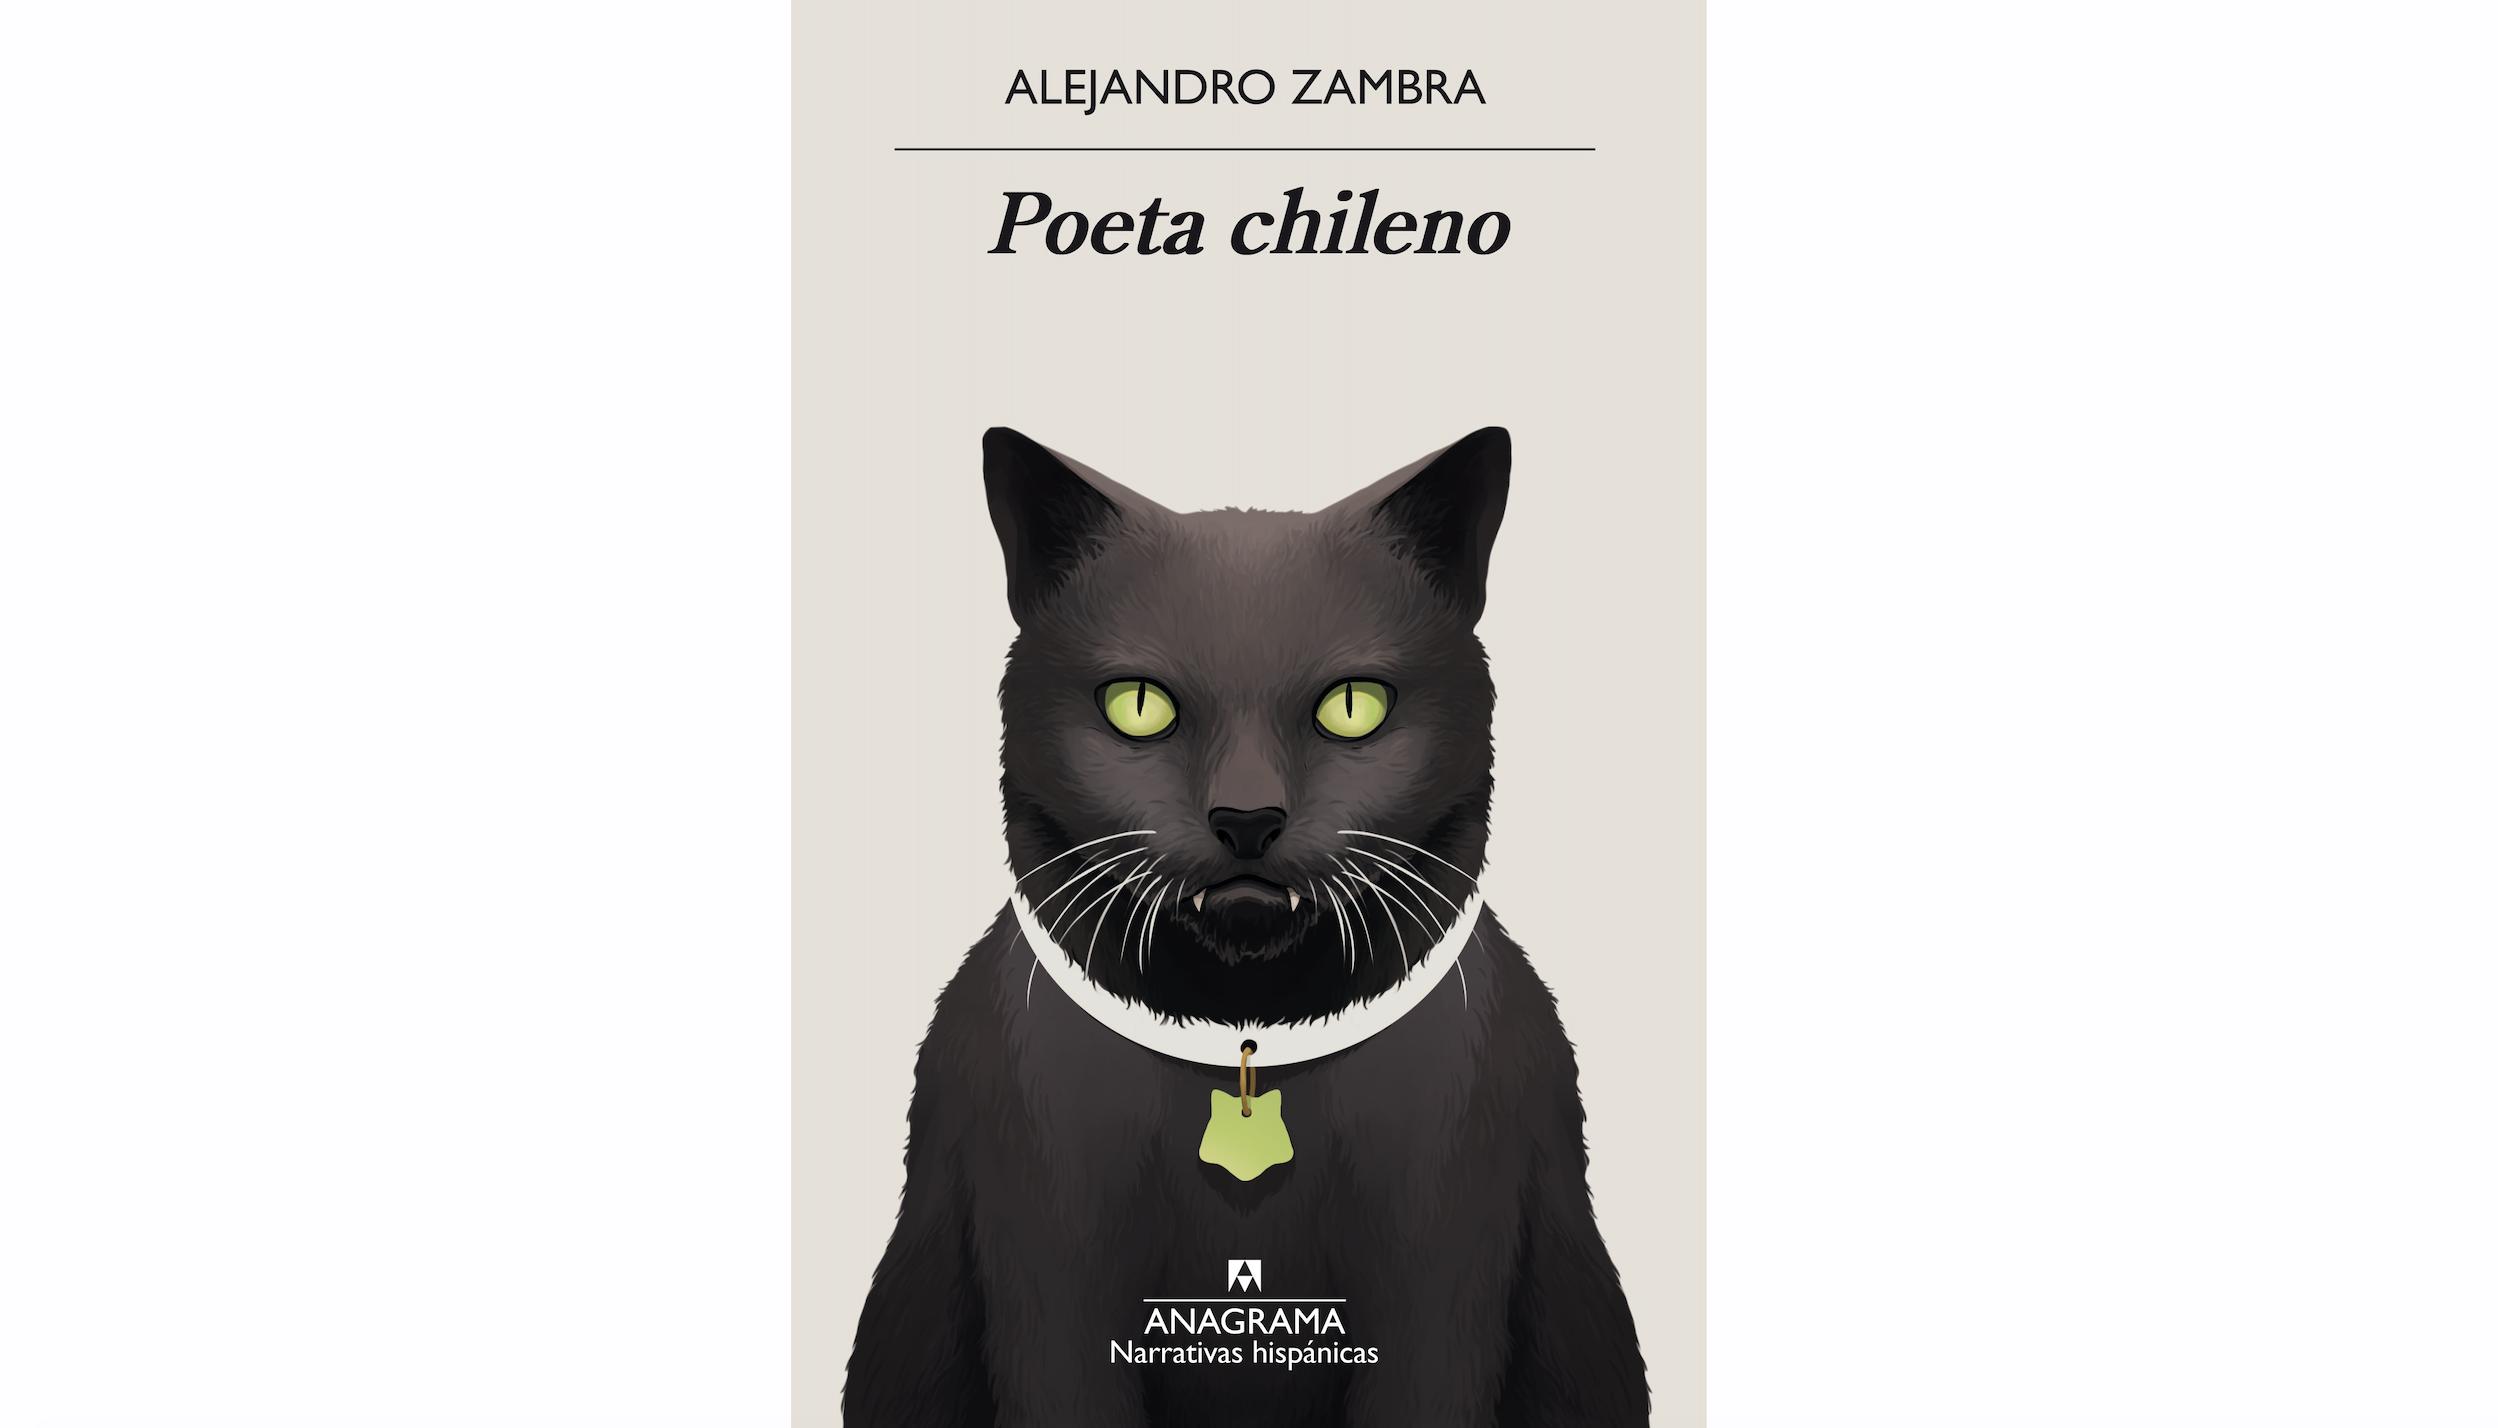 Poeta chileno, d'Alejandro Zambra